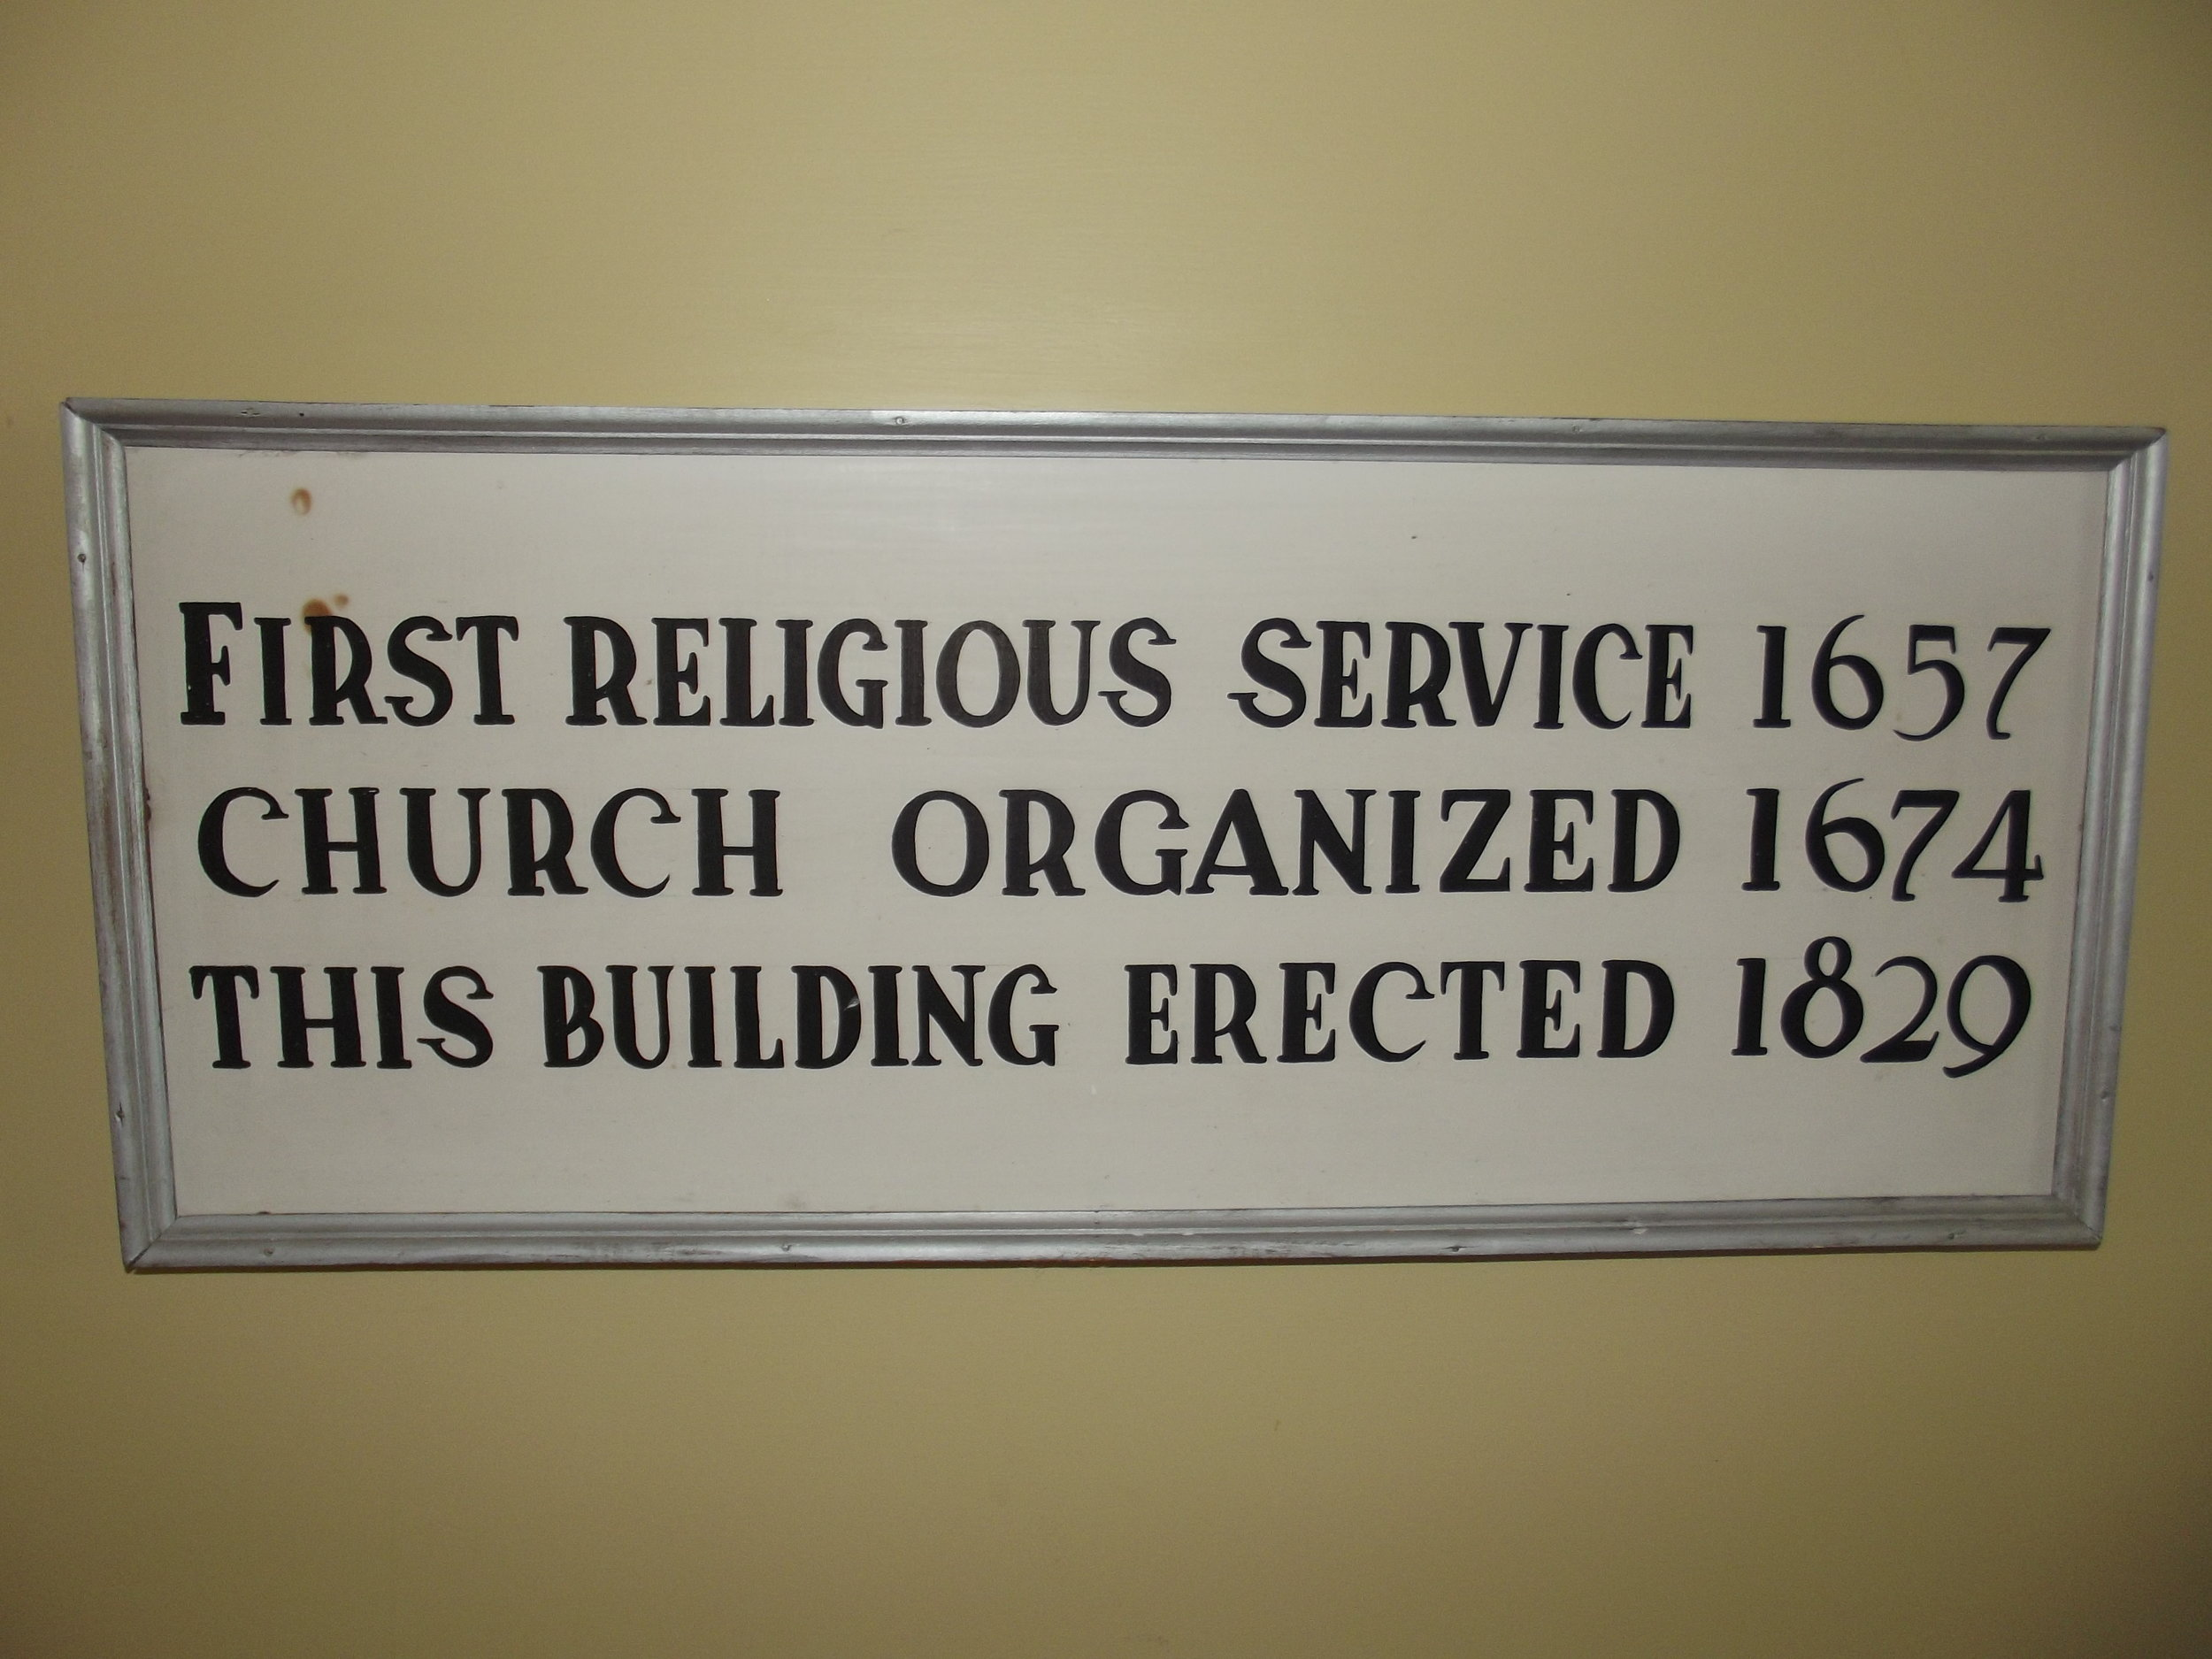 church organized sign.JPG